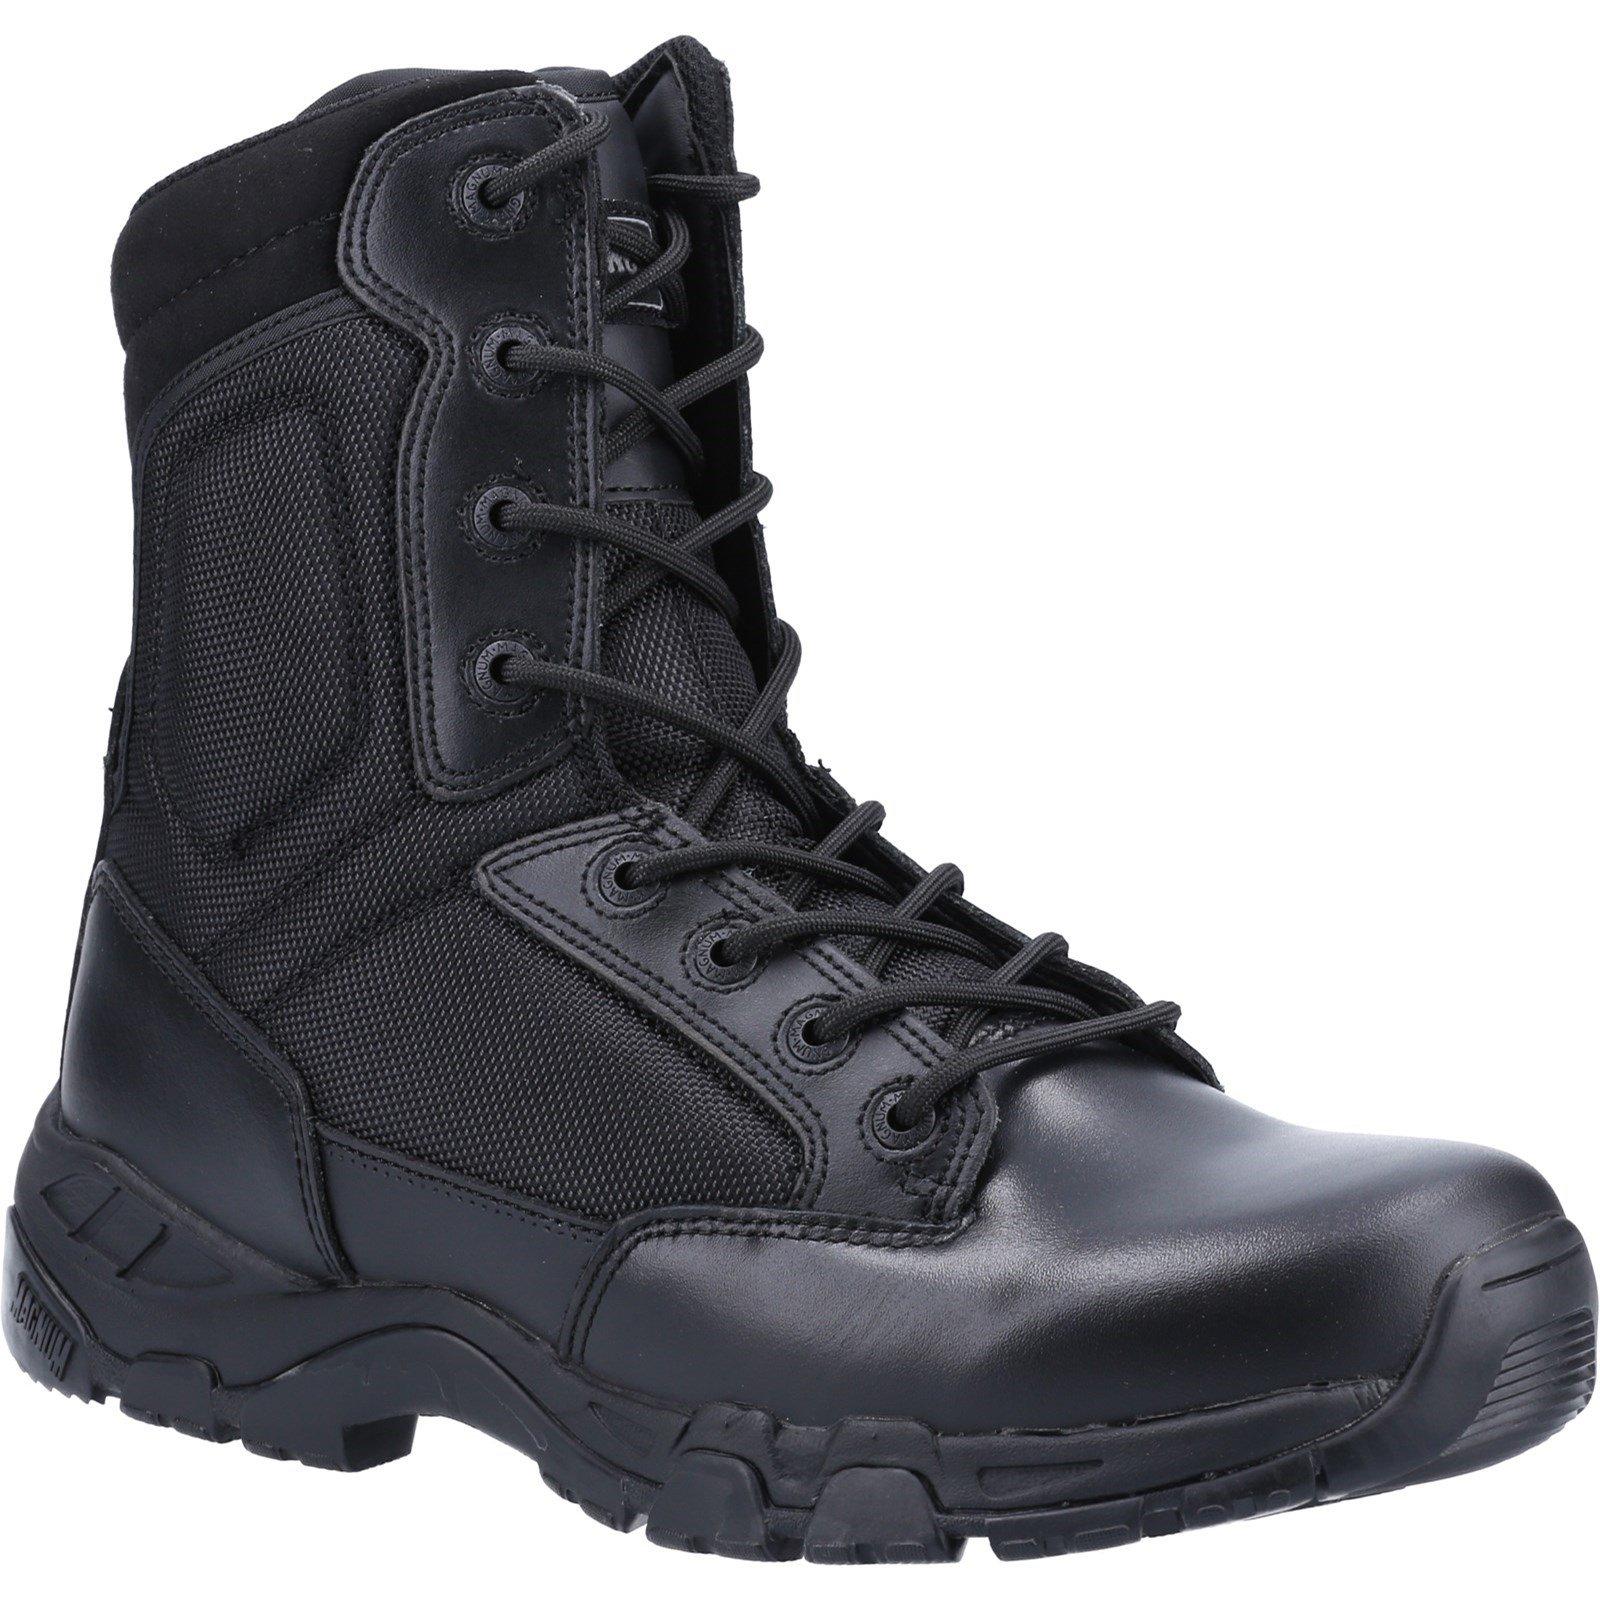 Magnum Unisex Viper Pro Plus Side-Zip Uniform Boot Black 33533 - Black 8